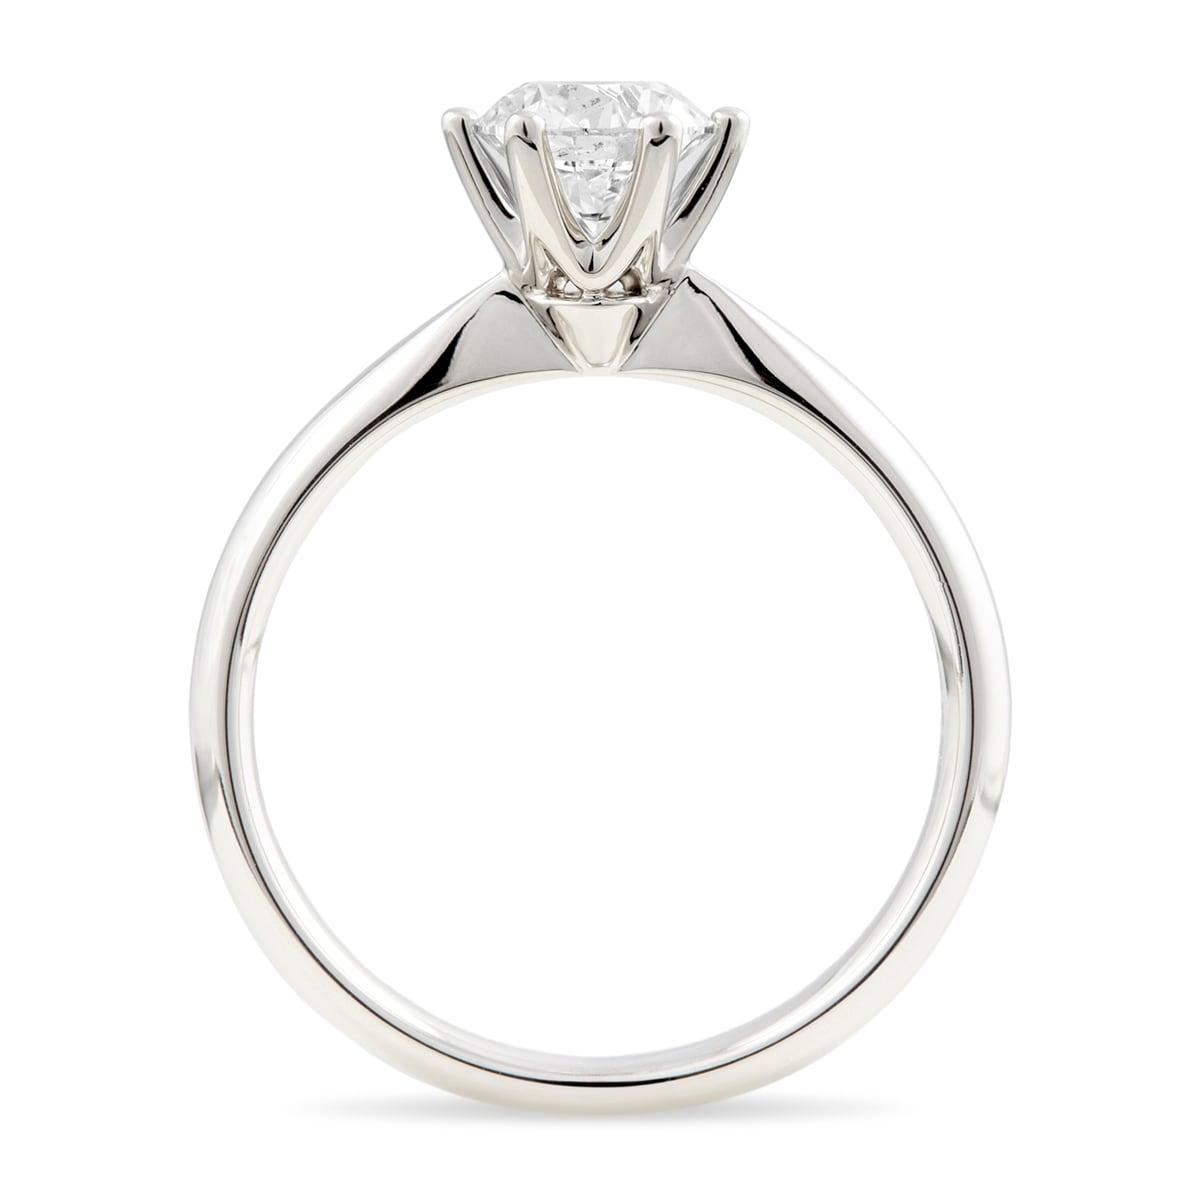 Sandin-1956-One-Carat-Diamantring-solitar-1_00-ct-sida--hos-Jarl-Sandin_3773